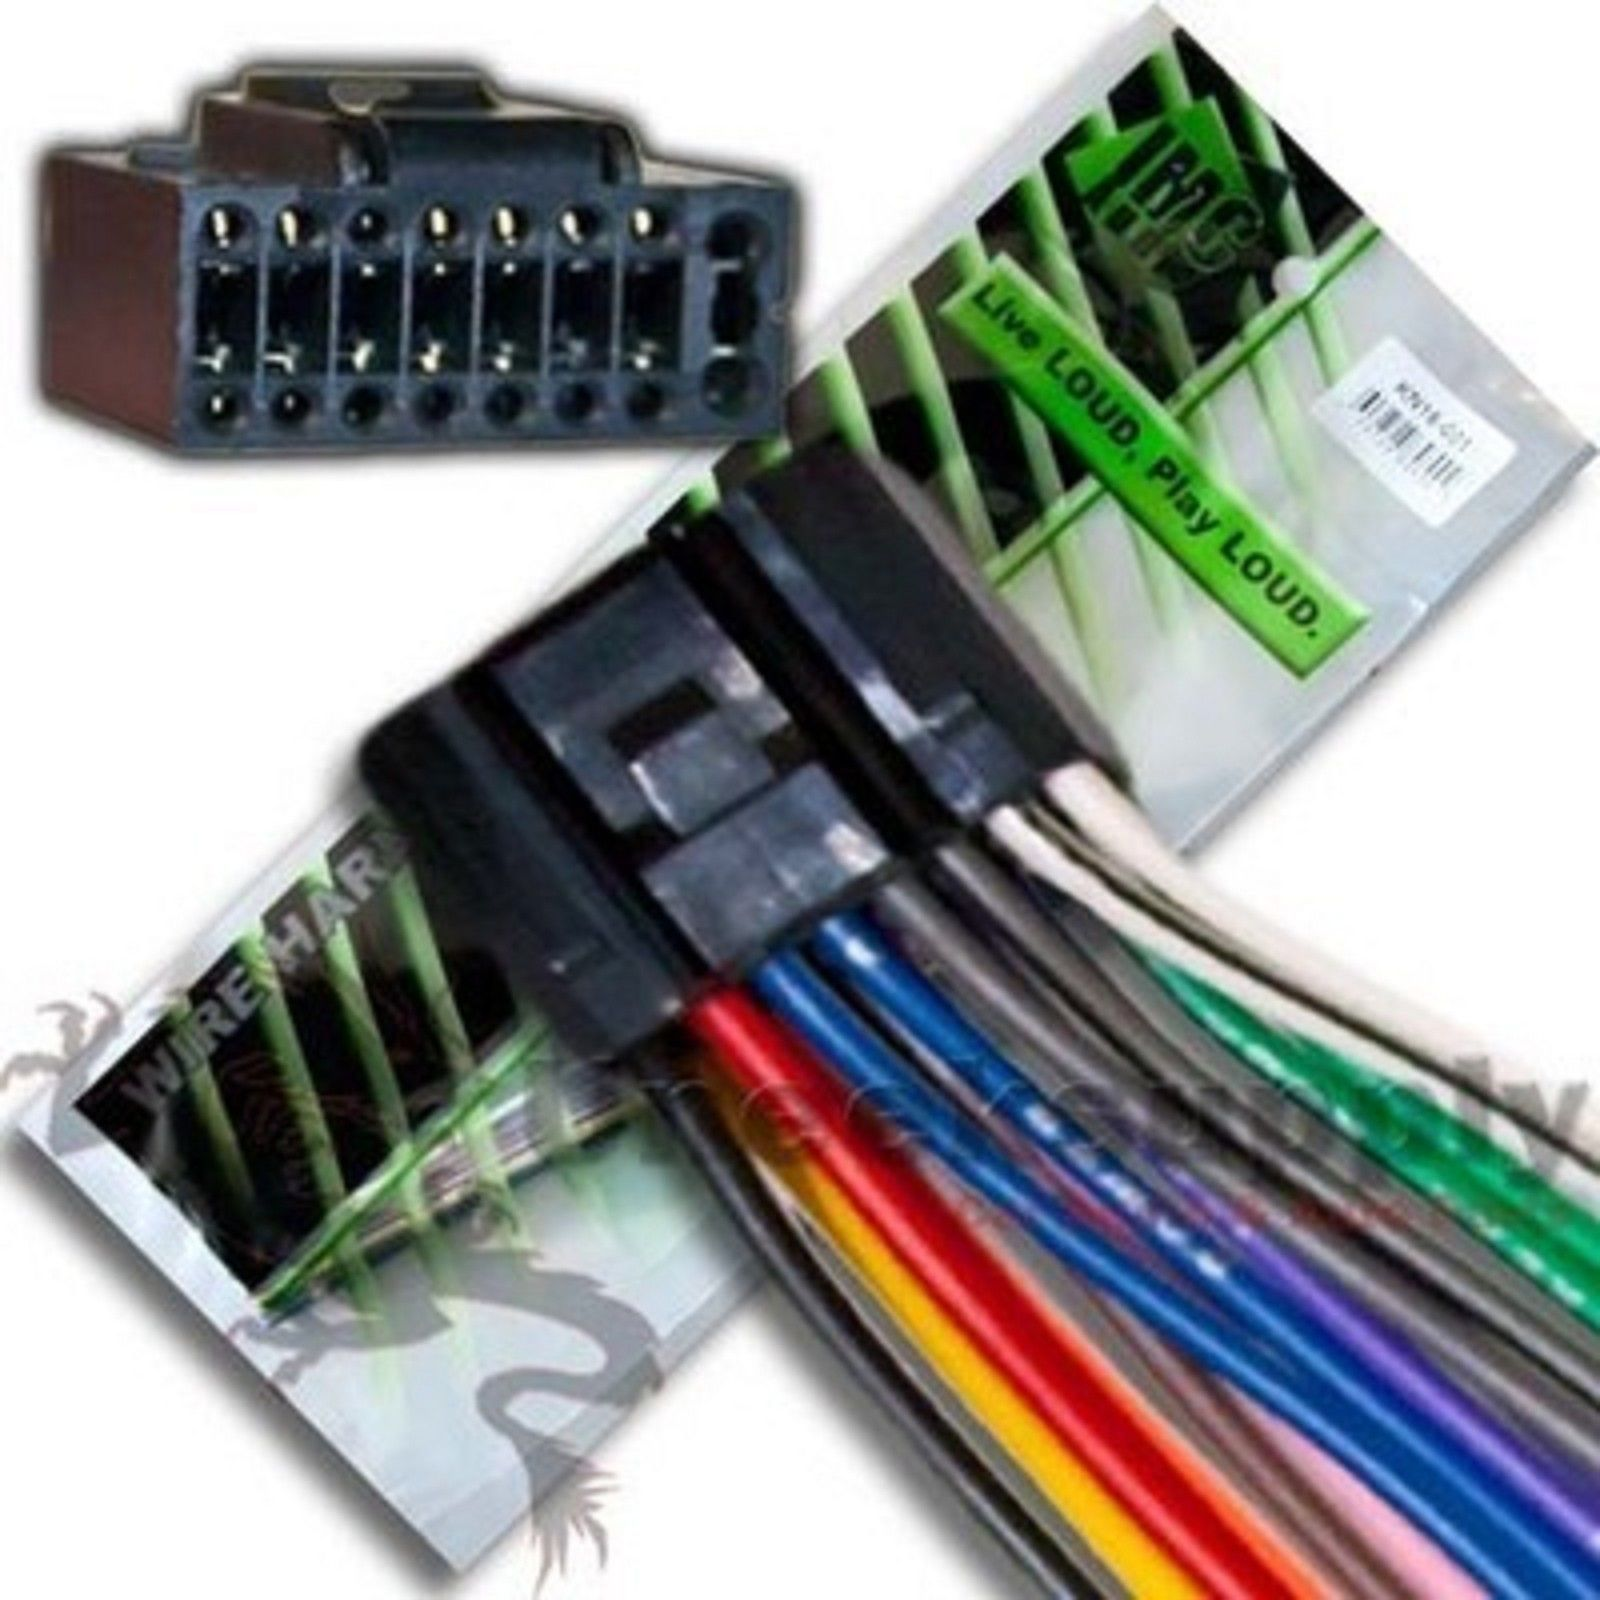 8 94 kenwood wire harness kdc mp145 mp145cr mp245 h94 ebay electronics [ 1600 x 1600 Pixel ]